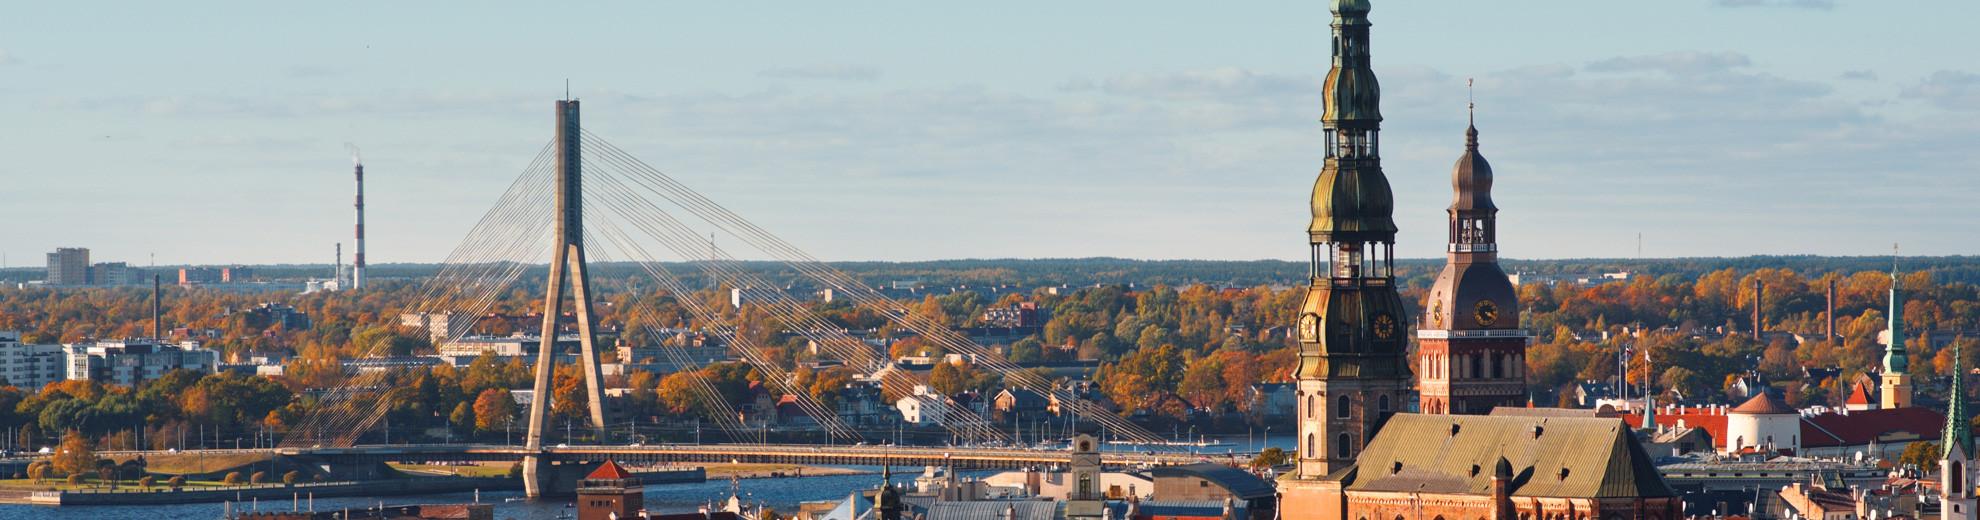 Latvijas Banka has revised its macroeconomic forecasts for Latvia